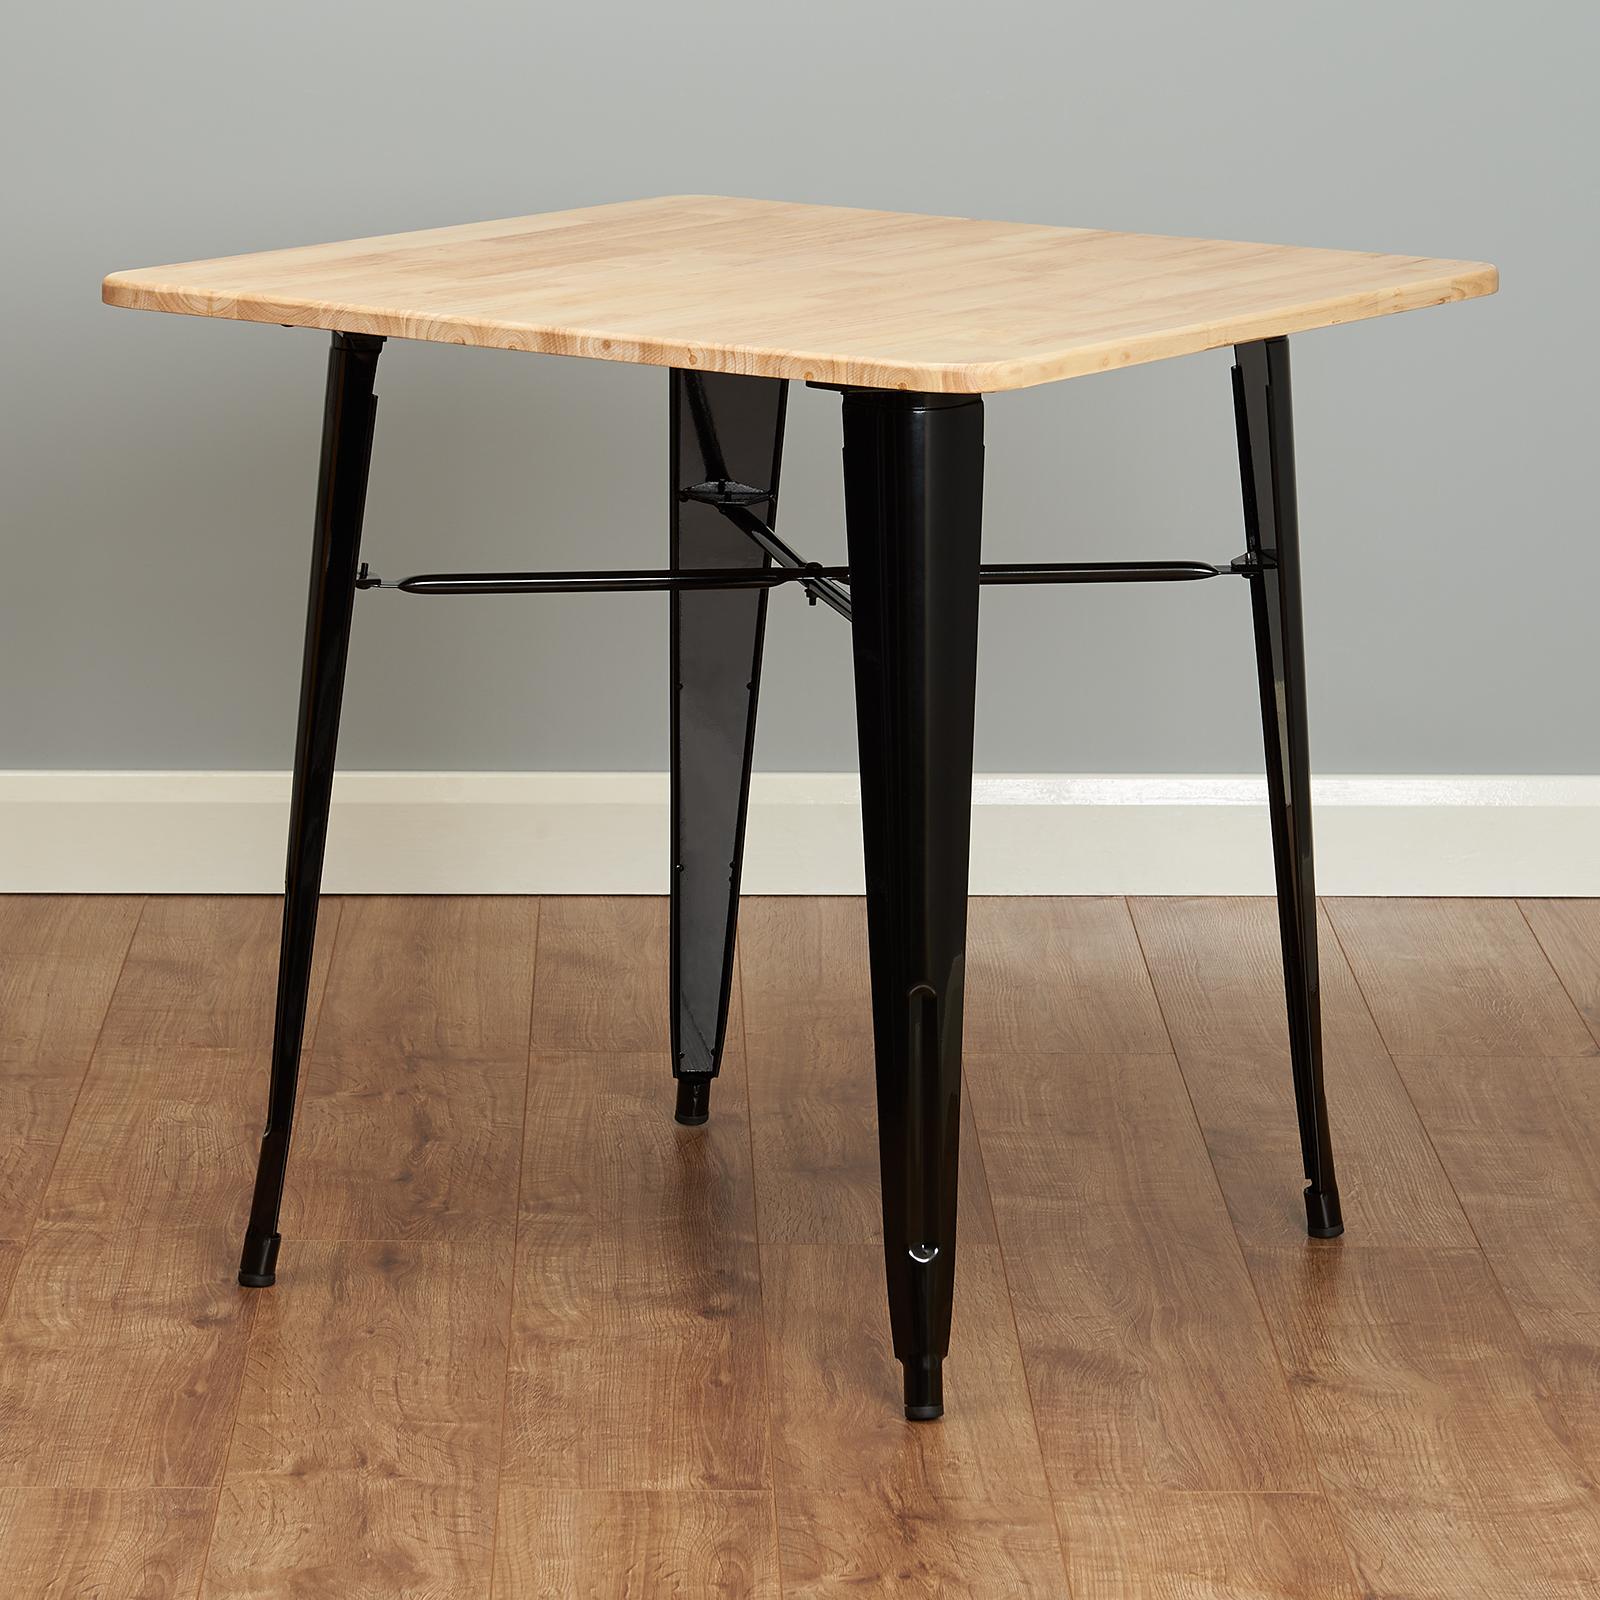 Tavolo Da Pranzo Stile Industriale.Hartleys Tavolo Tavoli Da Pranzo Stile Industriale Nero Con